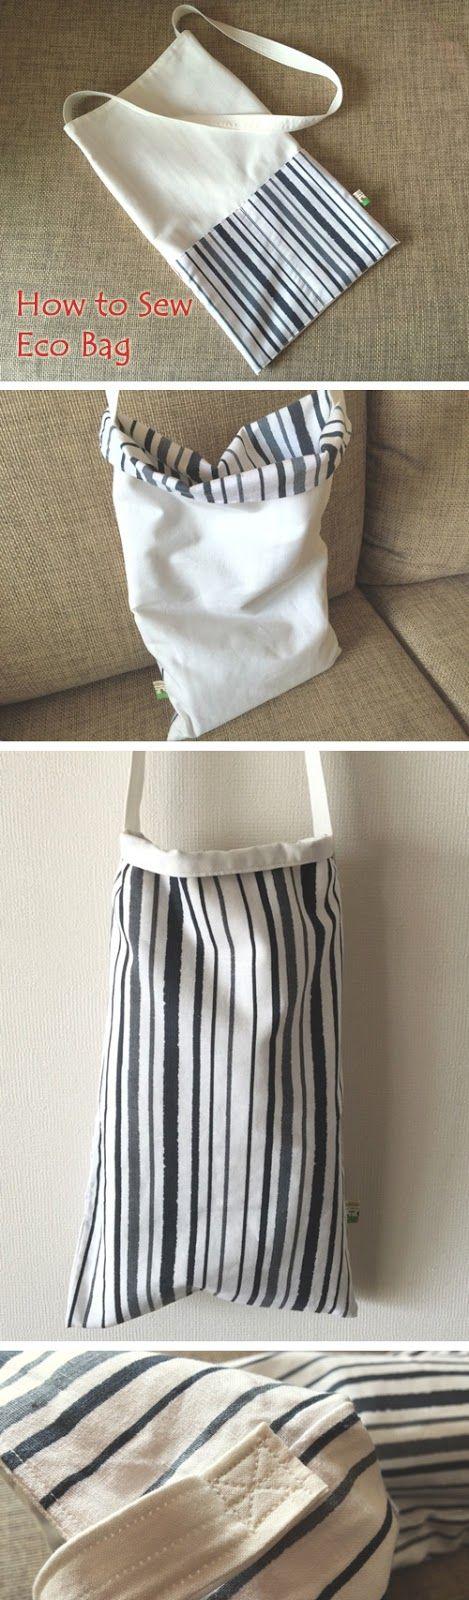 Easy  Reusable Grocery shopping Bag photo Tutorial.  http://www.handmadiya.com/2016/06/how-to-sew-double-sided-eco-bag.html